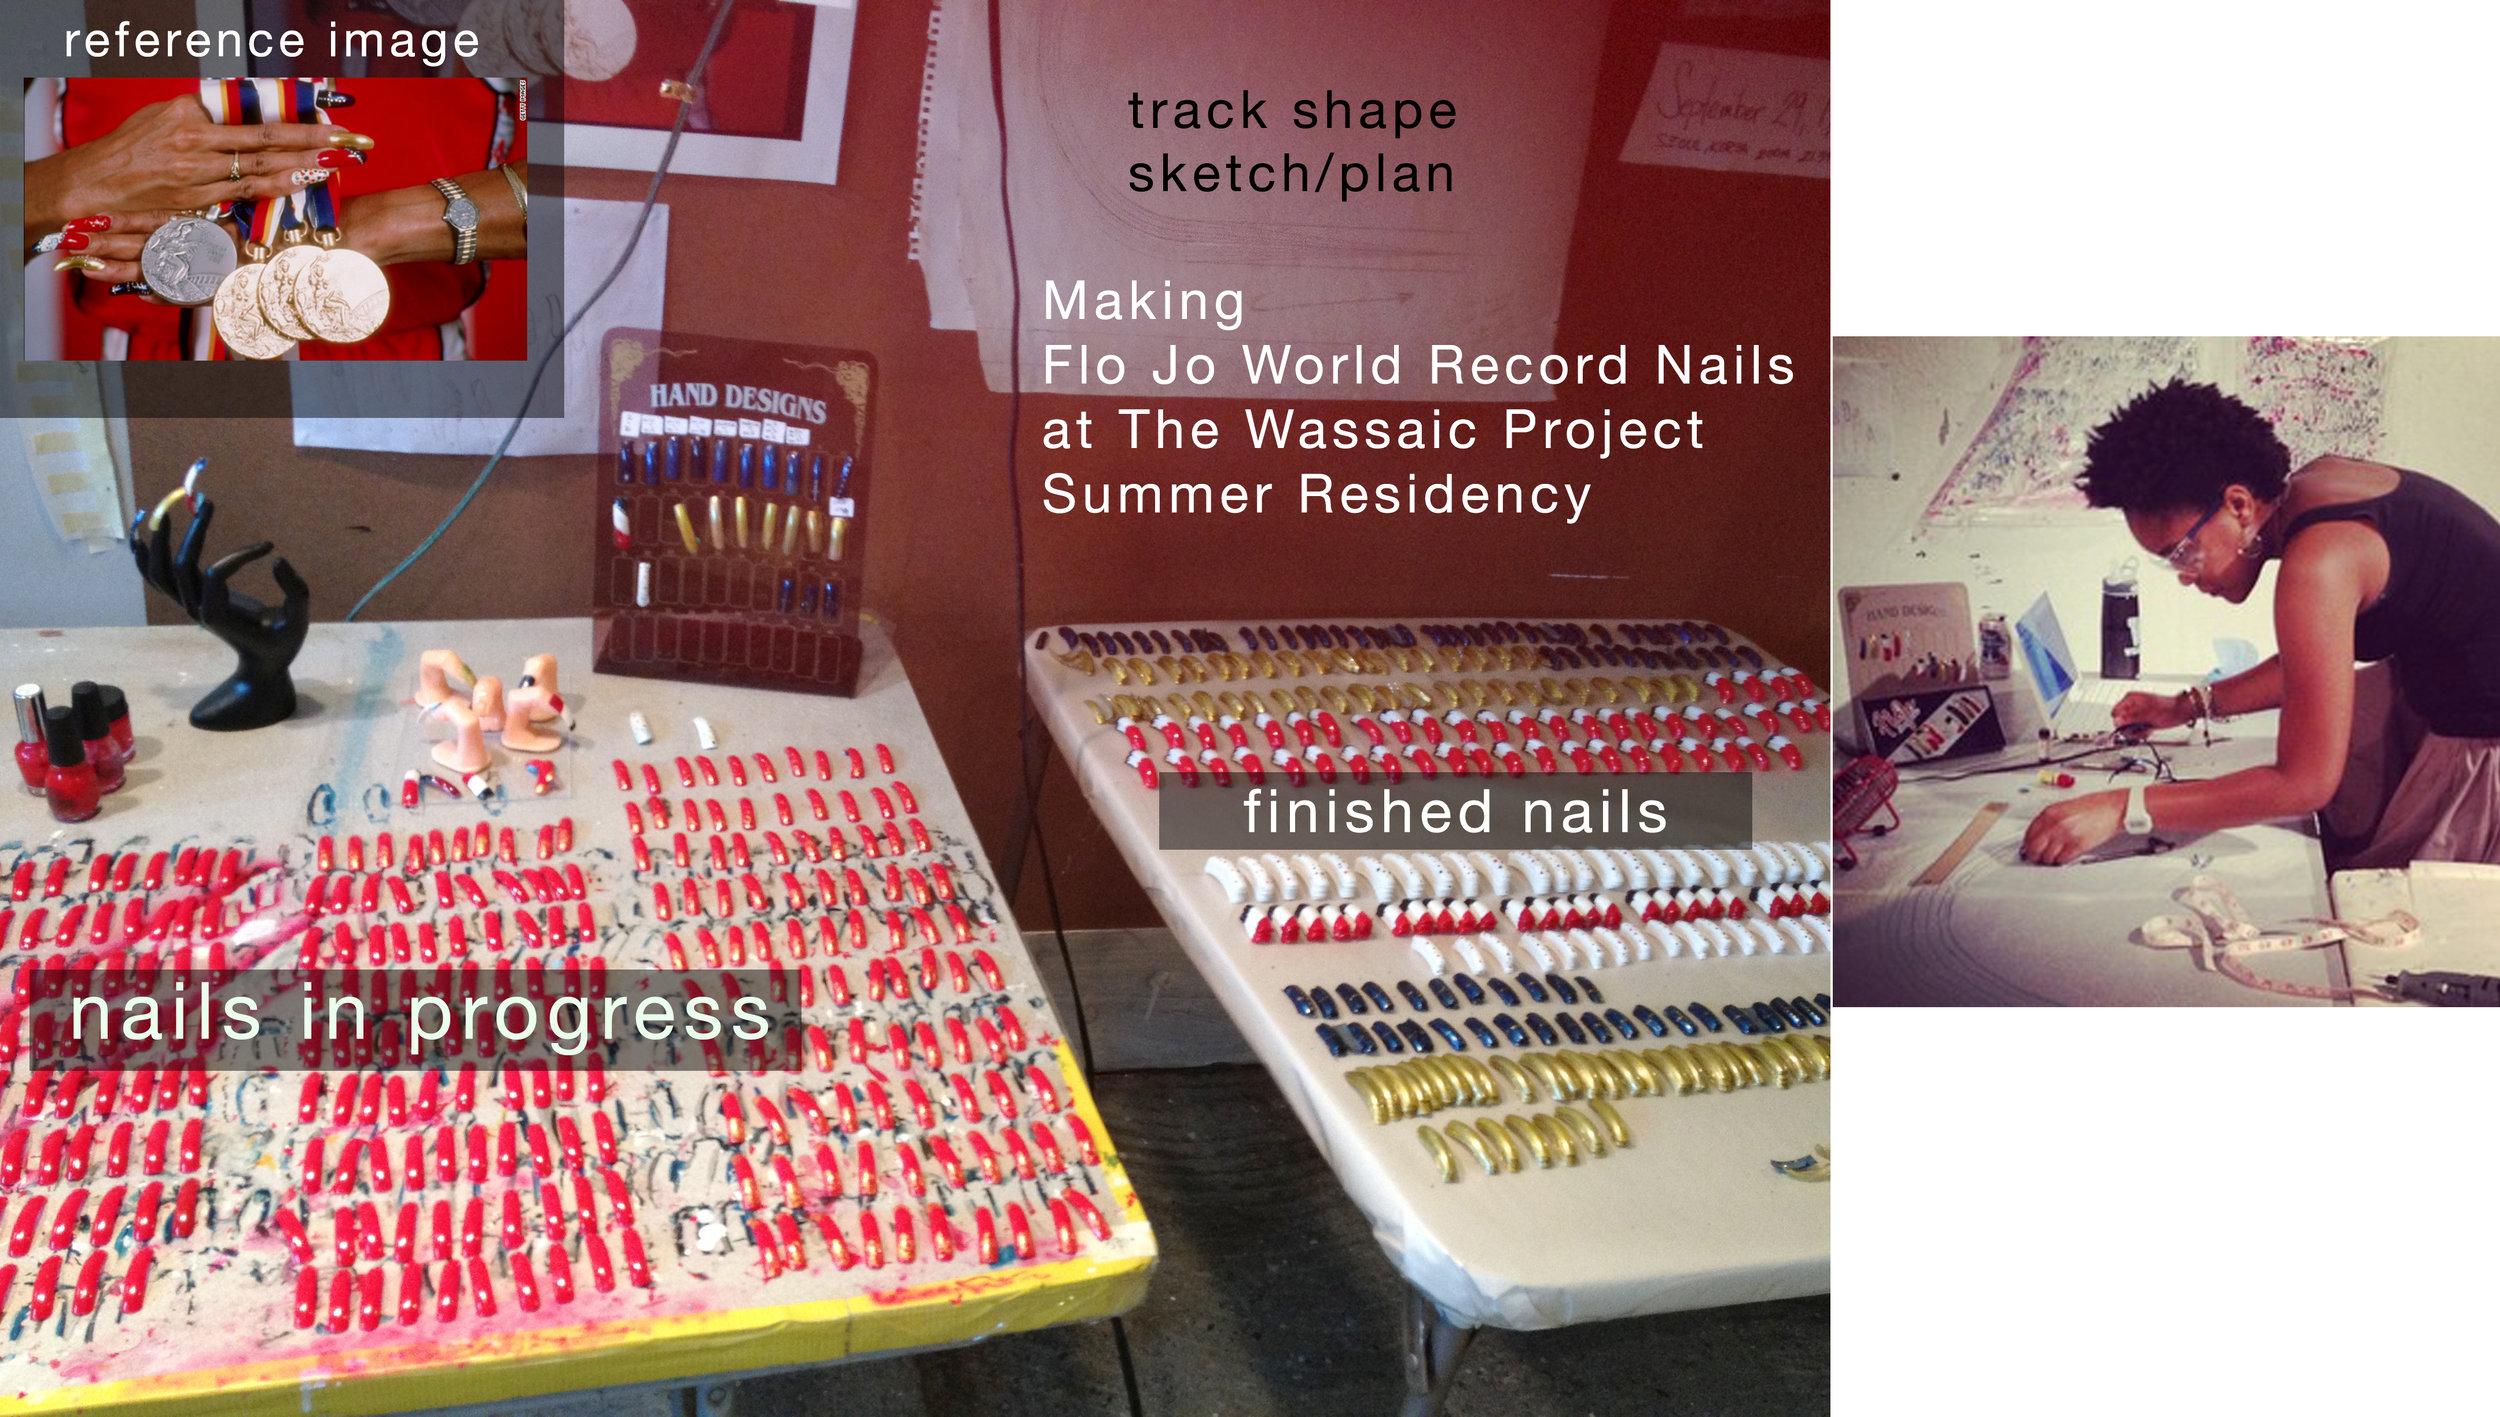 Flo Jo WR Nails progress.jpg